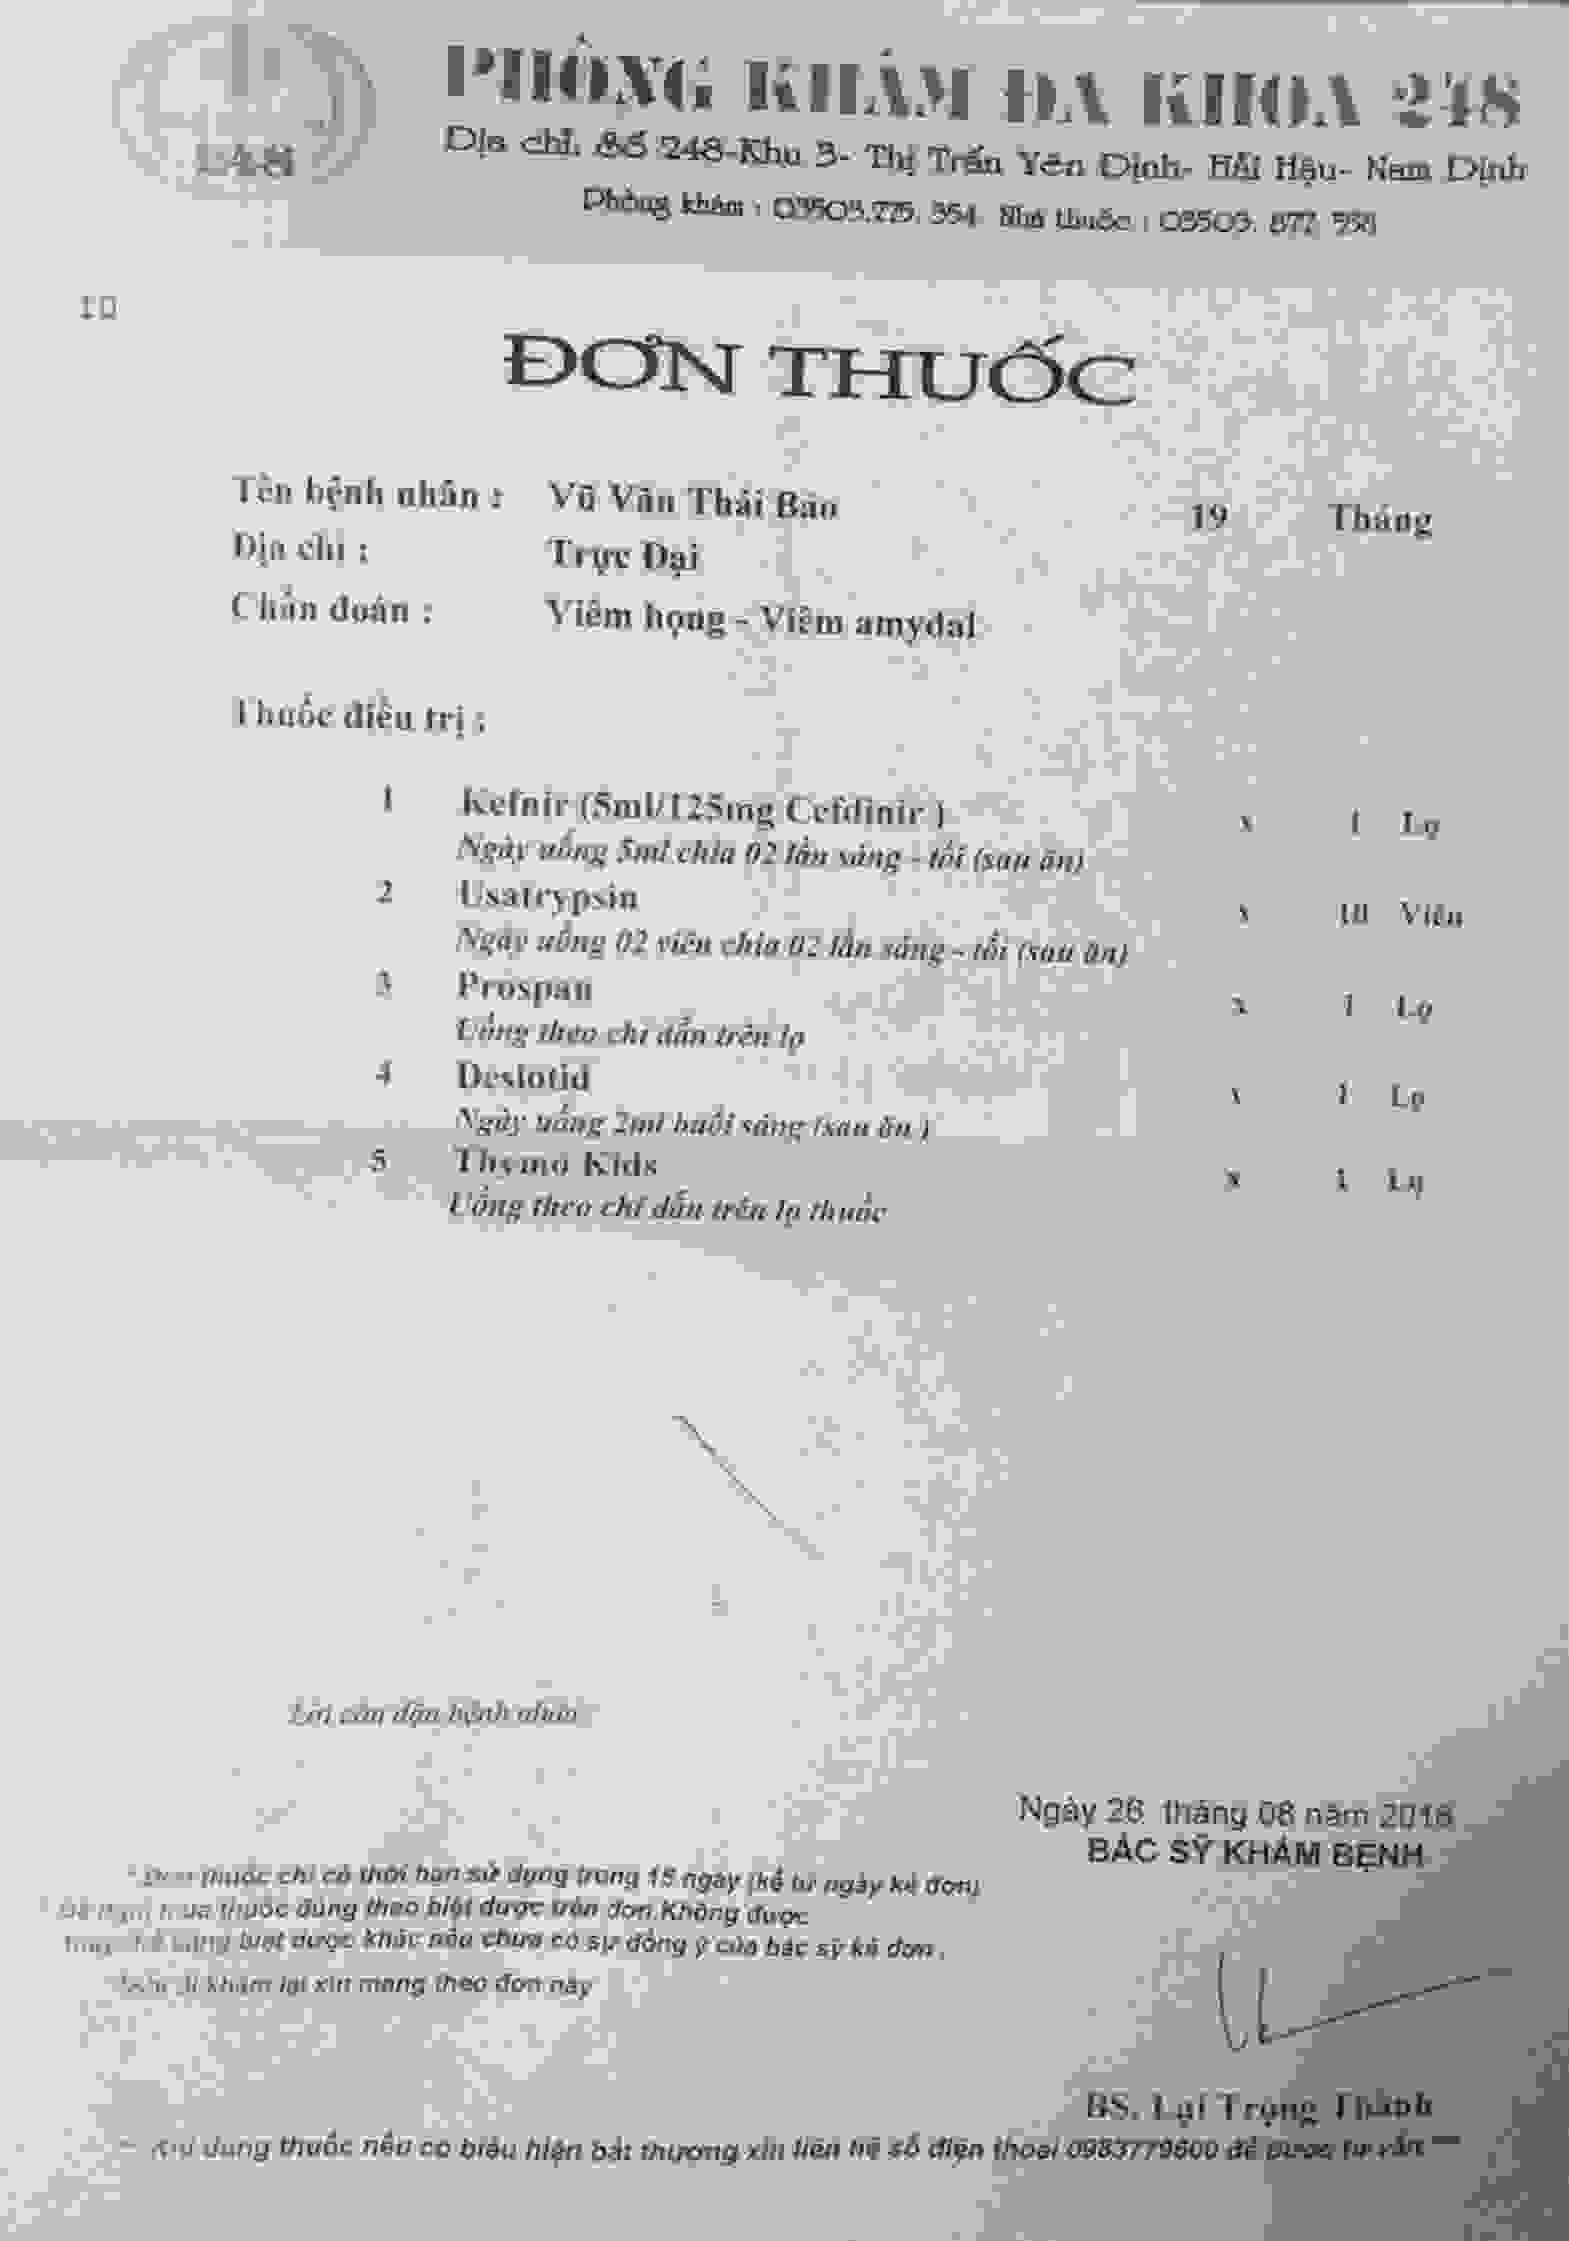 Don thuoc be Thai Bao